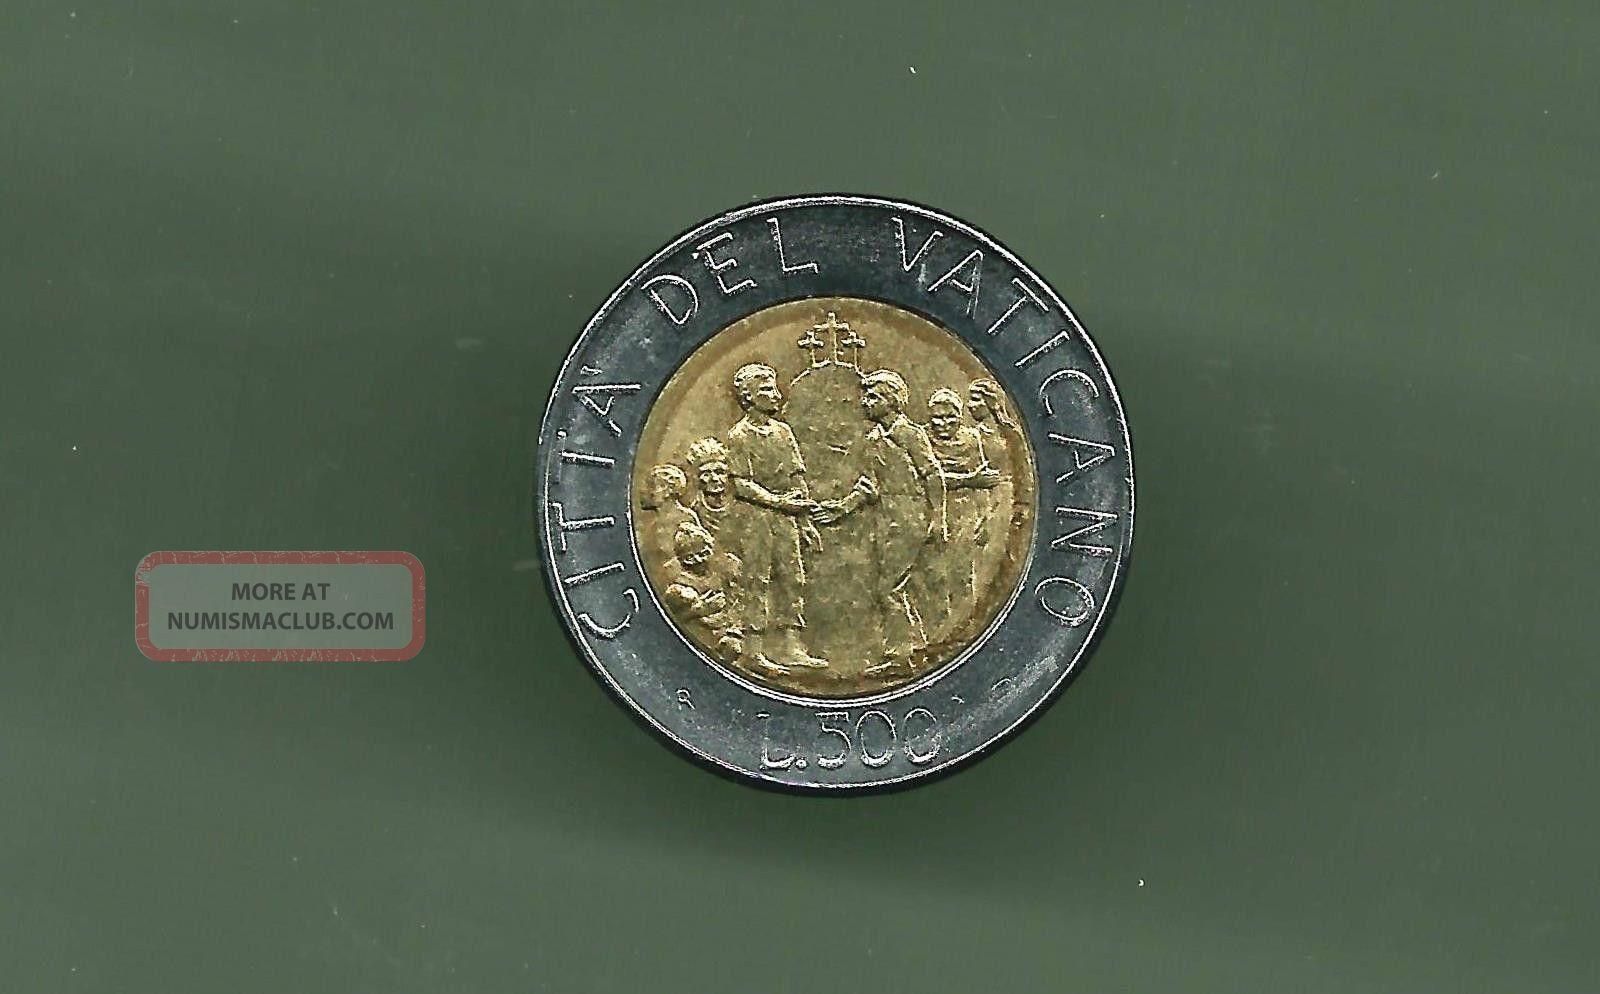 Vatican 1994 500 Lire Bi - Metallic Unc Coin Italy, San Marino, Vatican photo